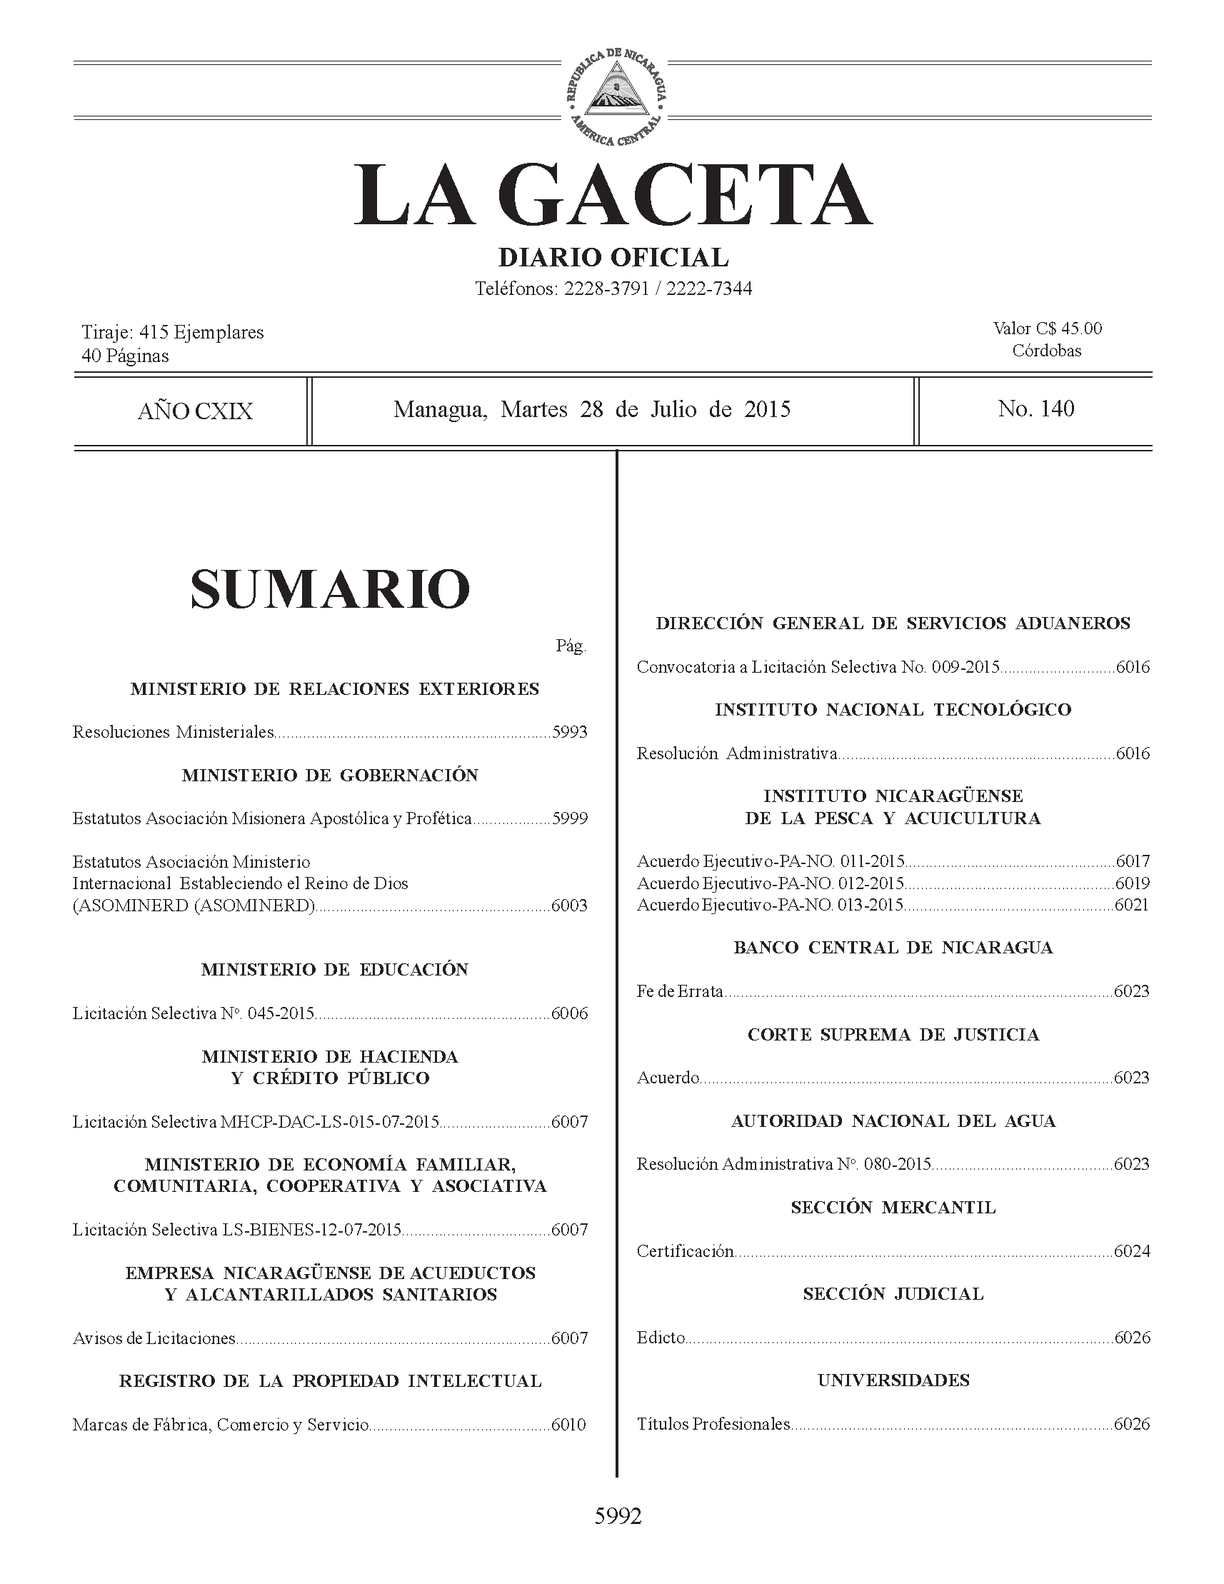 Calaméo - Gaceta No 140 Martes 28 De Julio 2015